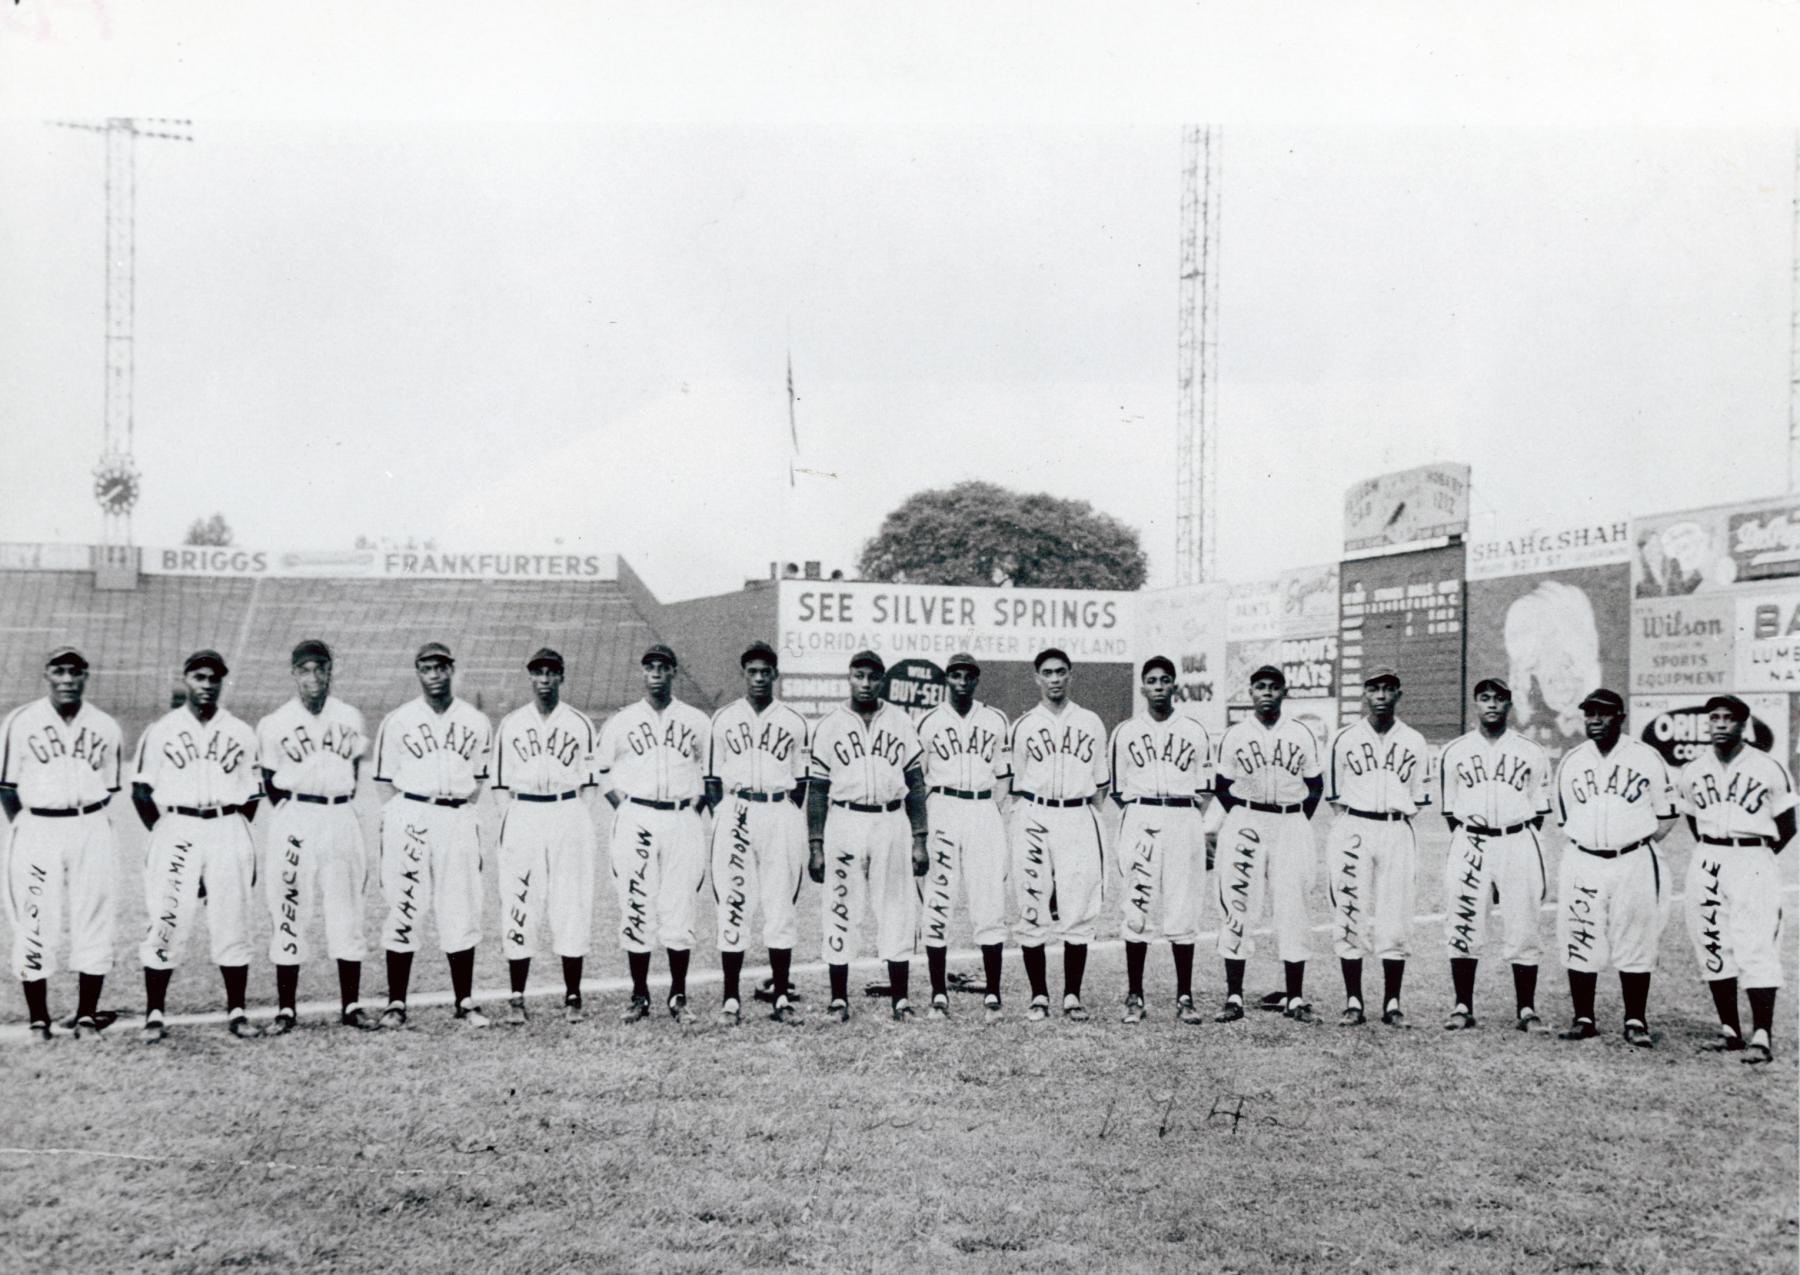 The 1943 Homestead Grays. BL-3284-72 (National Baseball Hall of Fame Library)